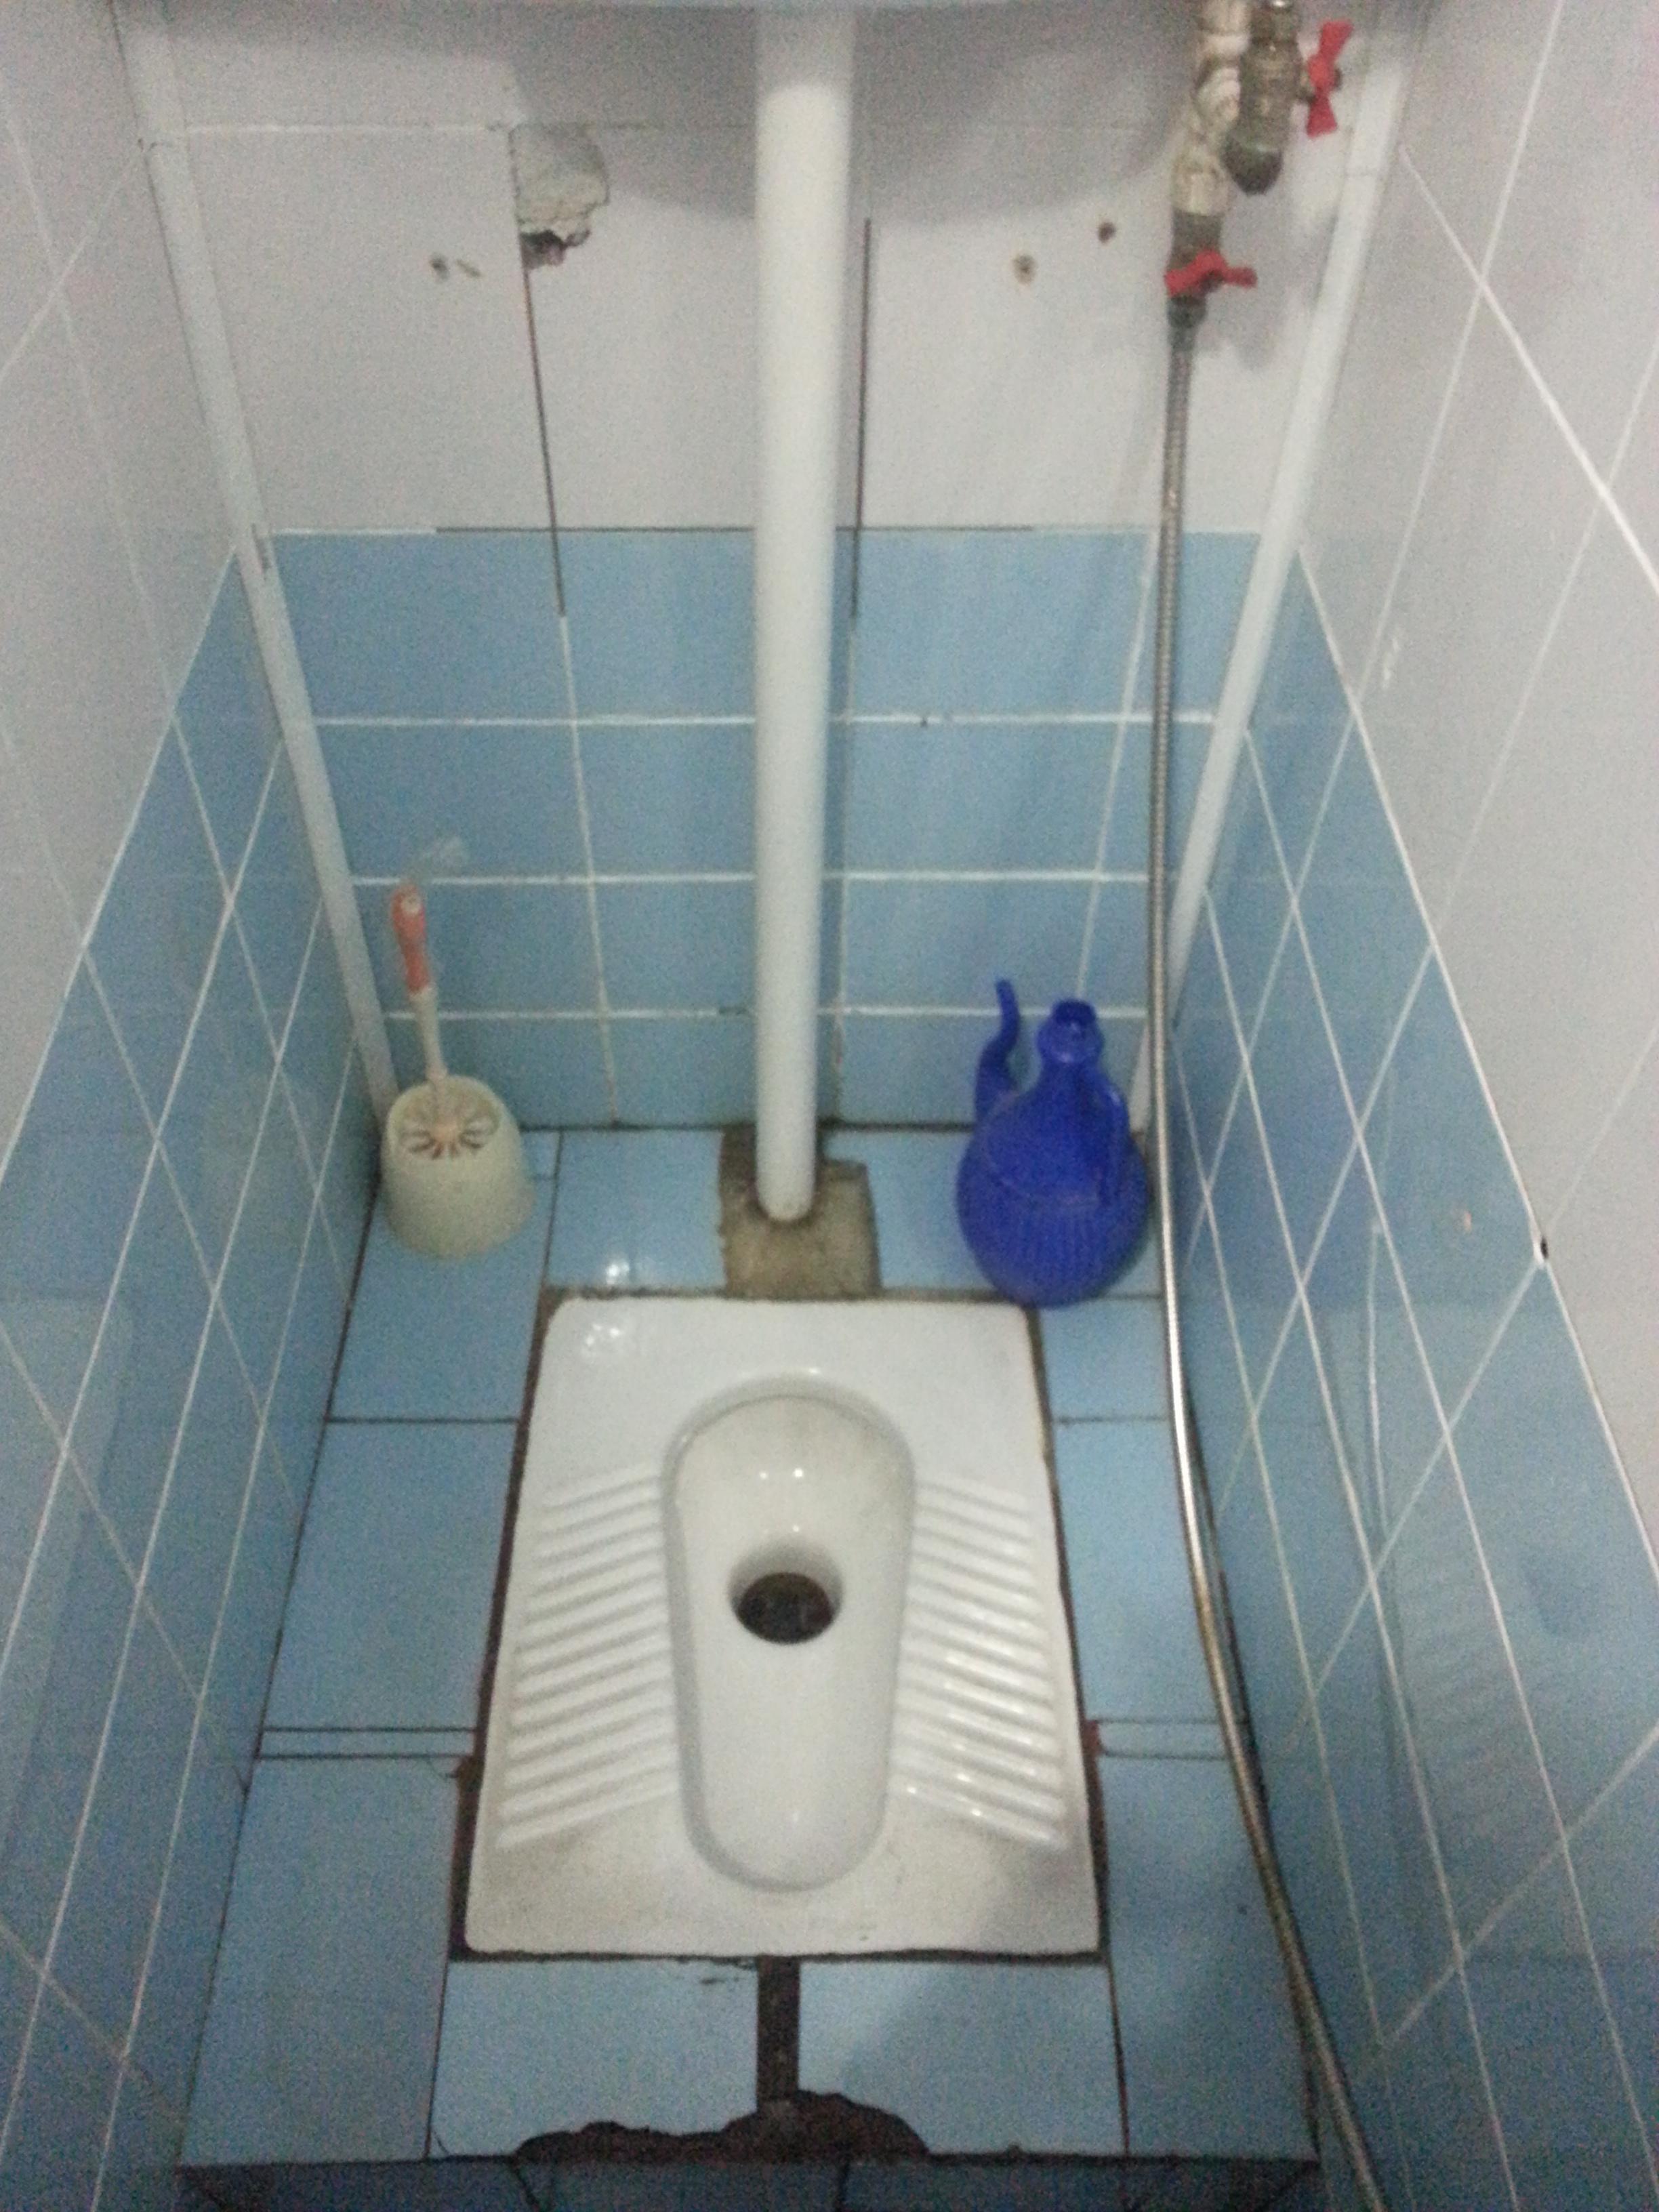 File:Muslim toilet.jpg - Wikimedia Commons